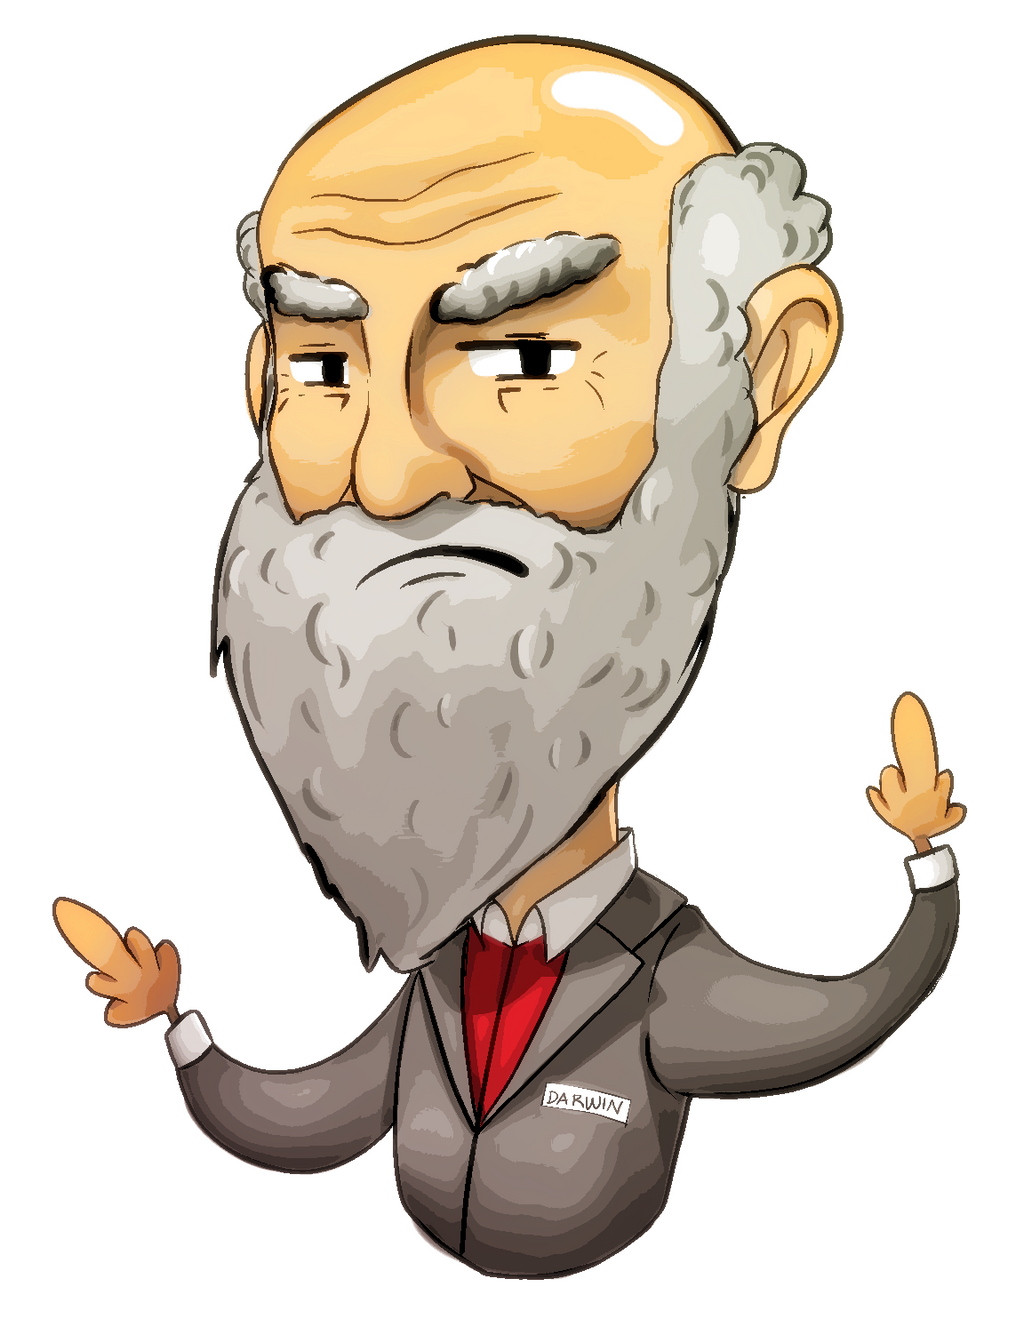 Darwin hates bigots by ValeriaDiStefano